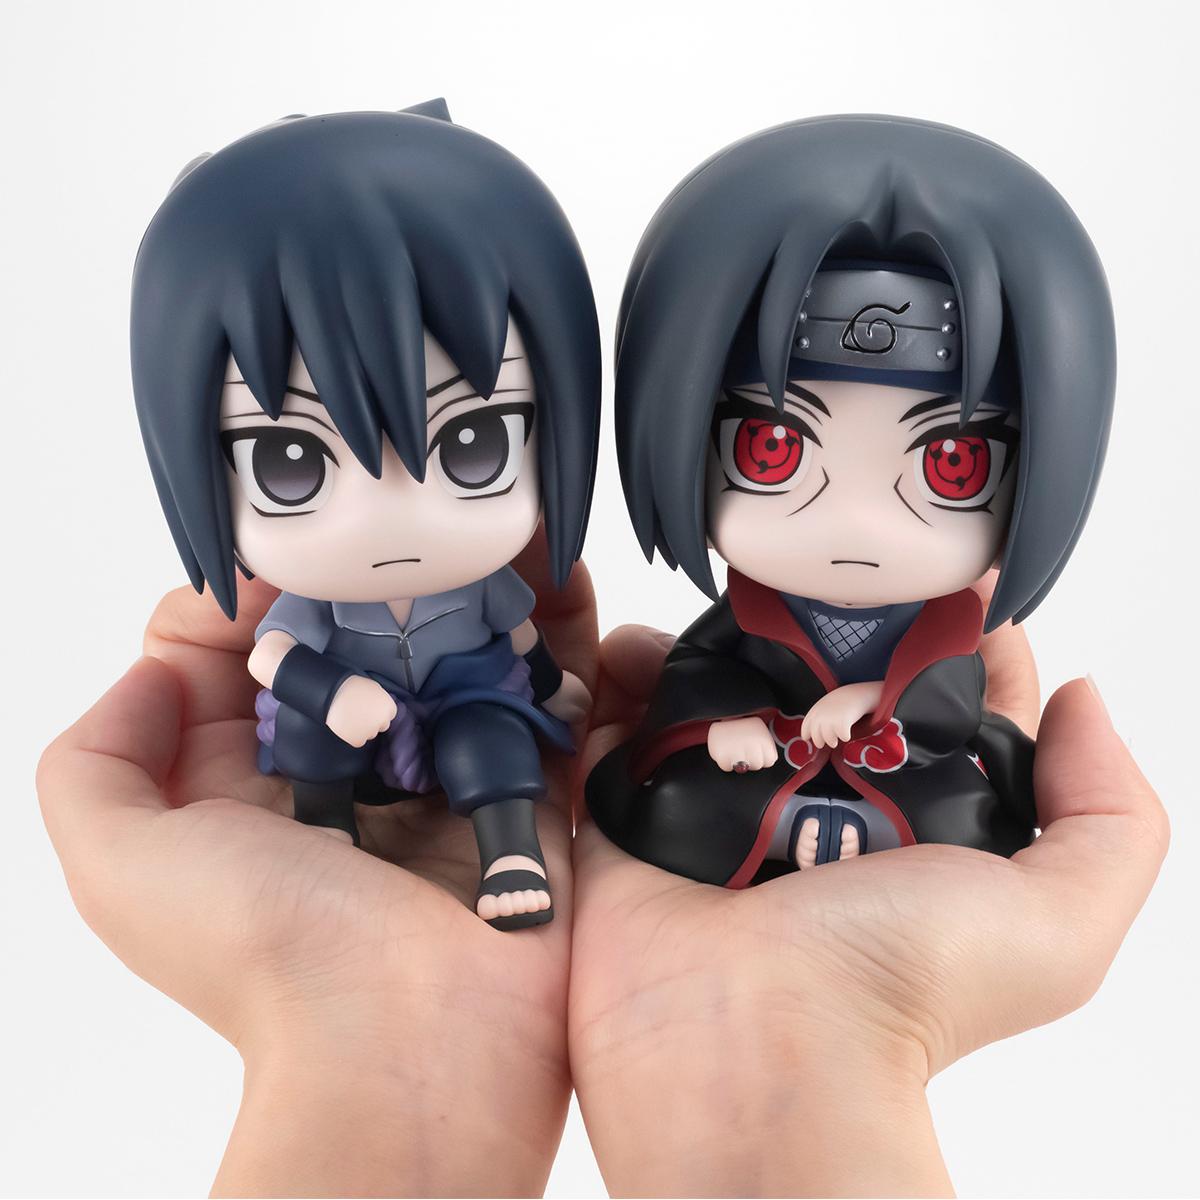 Sasuke & Itachi Look Up Series Naruto Figure Set with Gift